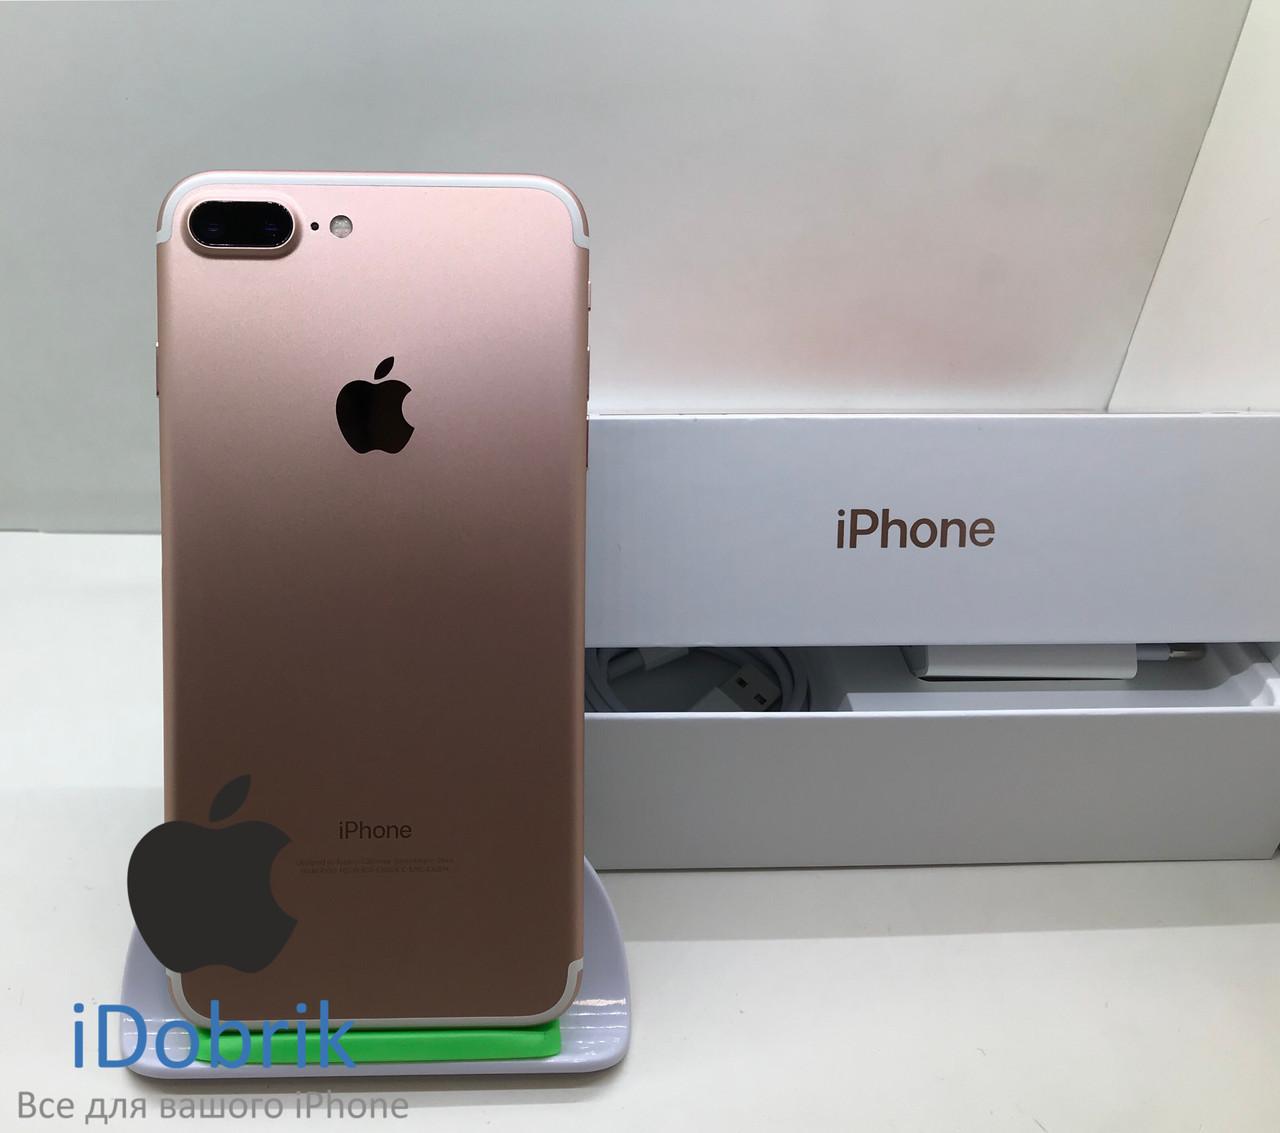 Б/У iPhone 7 Plus 128gb Rose Gold Neverlock 9/10